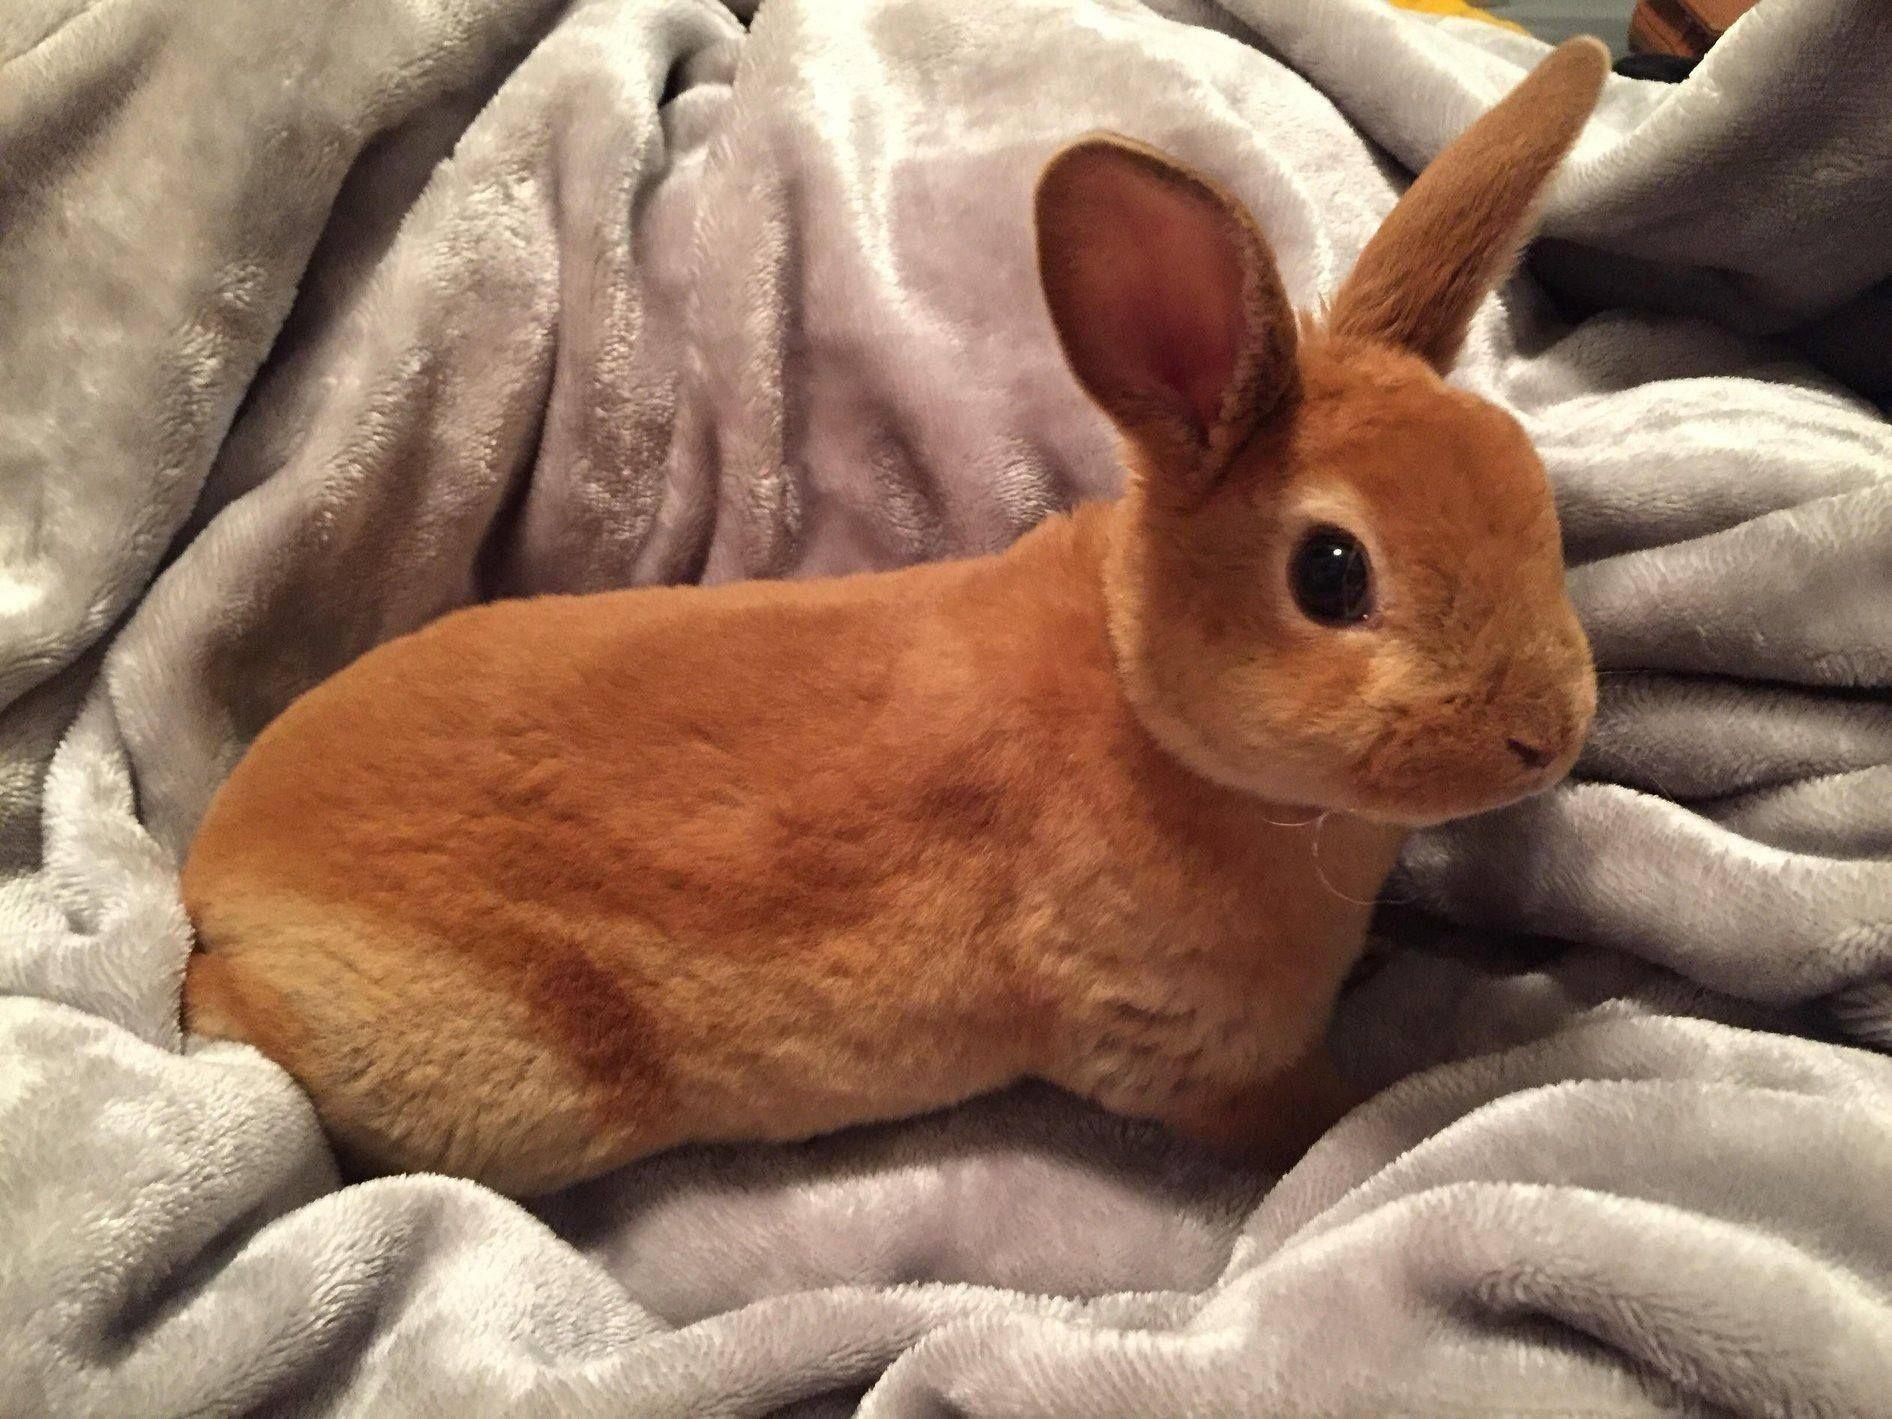 Pin By Winn Adams On Bunnies Cute Baby Animals Cute Animals Cute Baby Bunnies